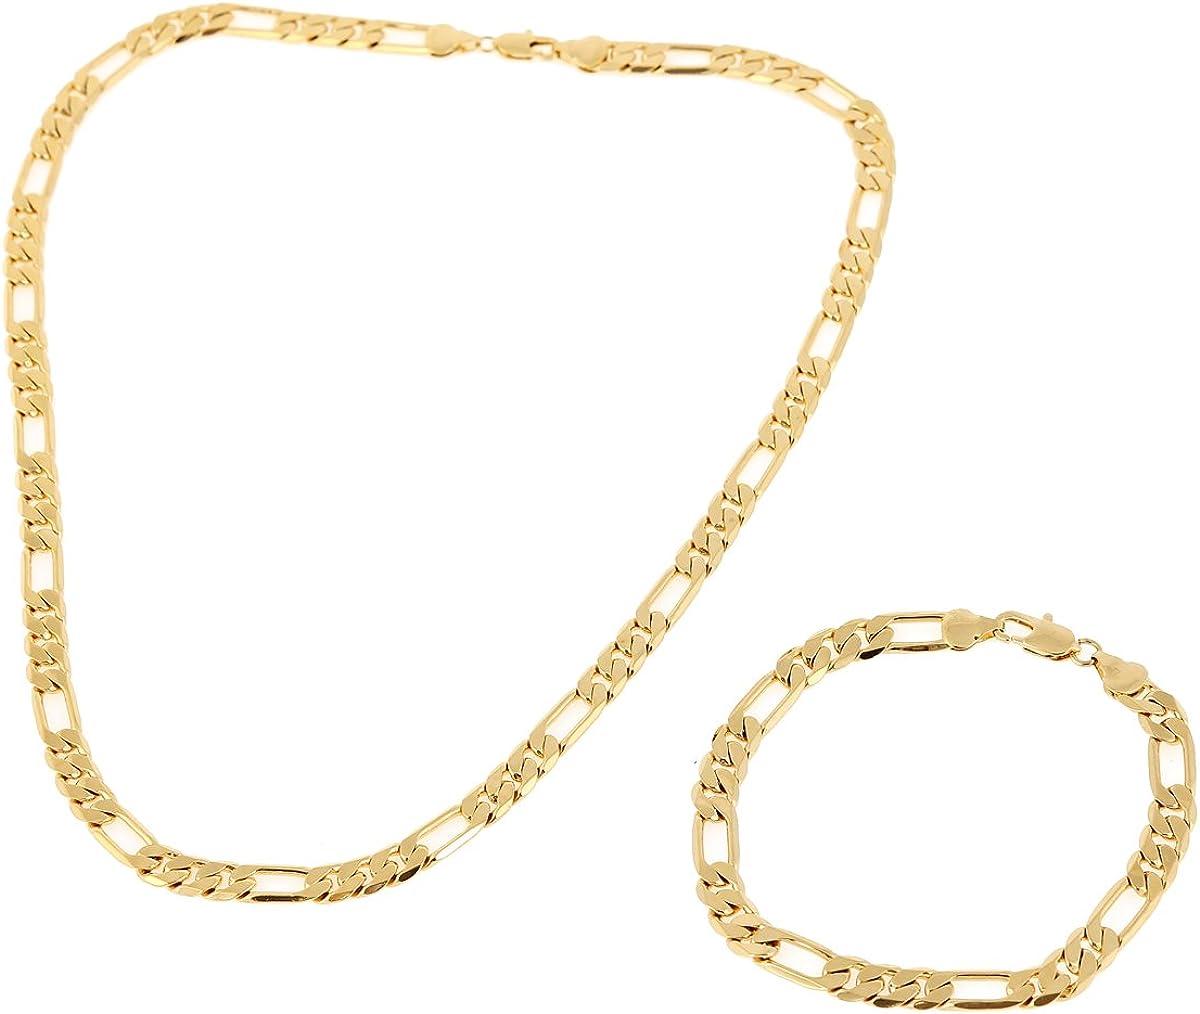 gold bead bracelet husband gift man jewelry 24 karat gold jewelry gold jewelry Gold plated men men bead bracelet 24k gold man bracelet